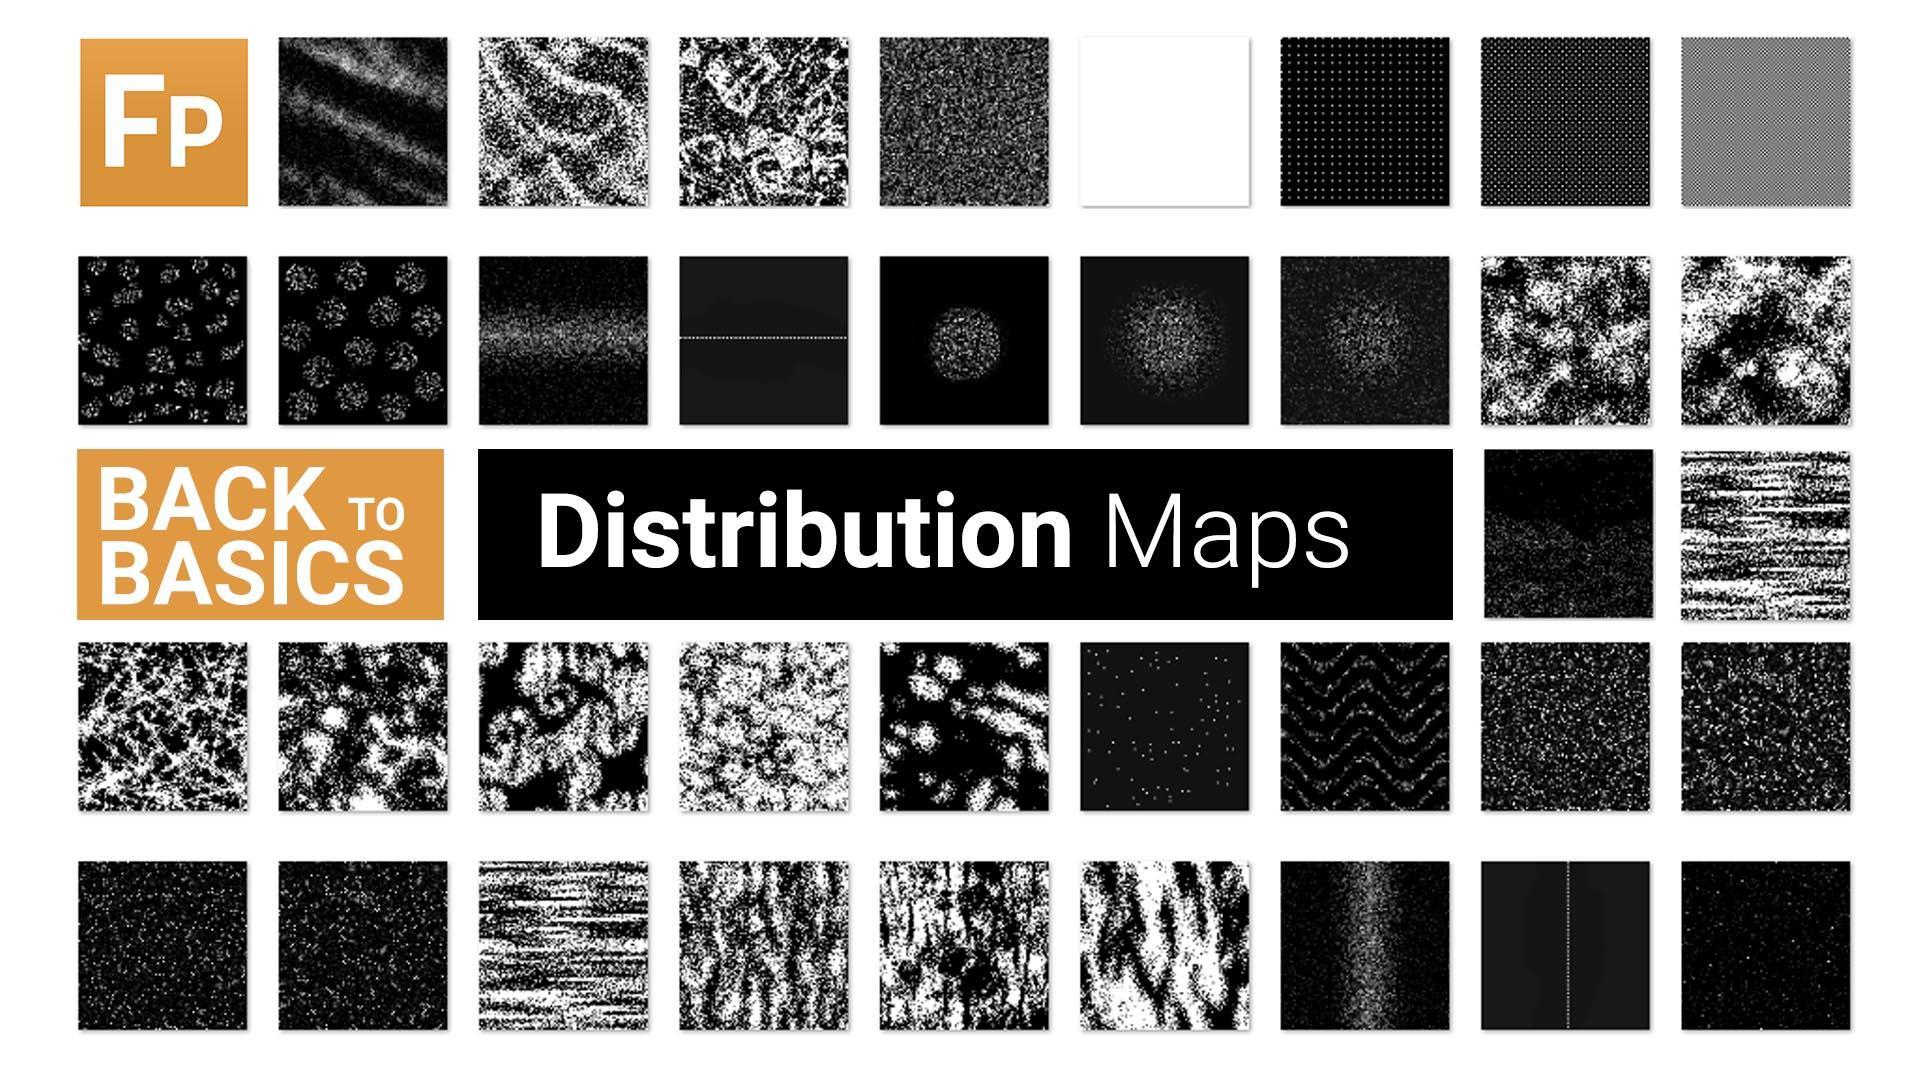 Back to Basics: Distribution Maps